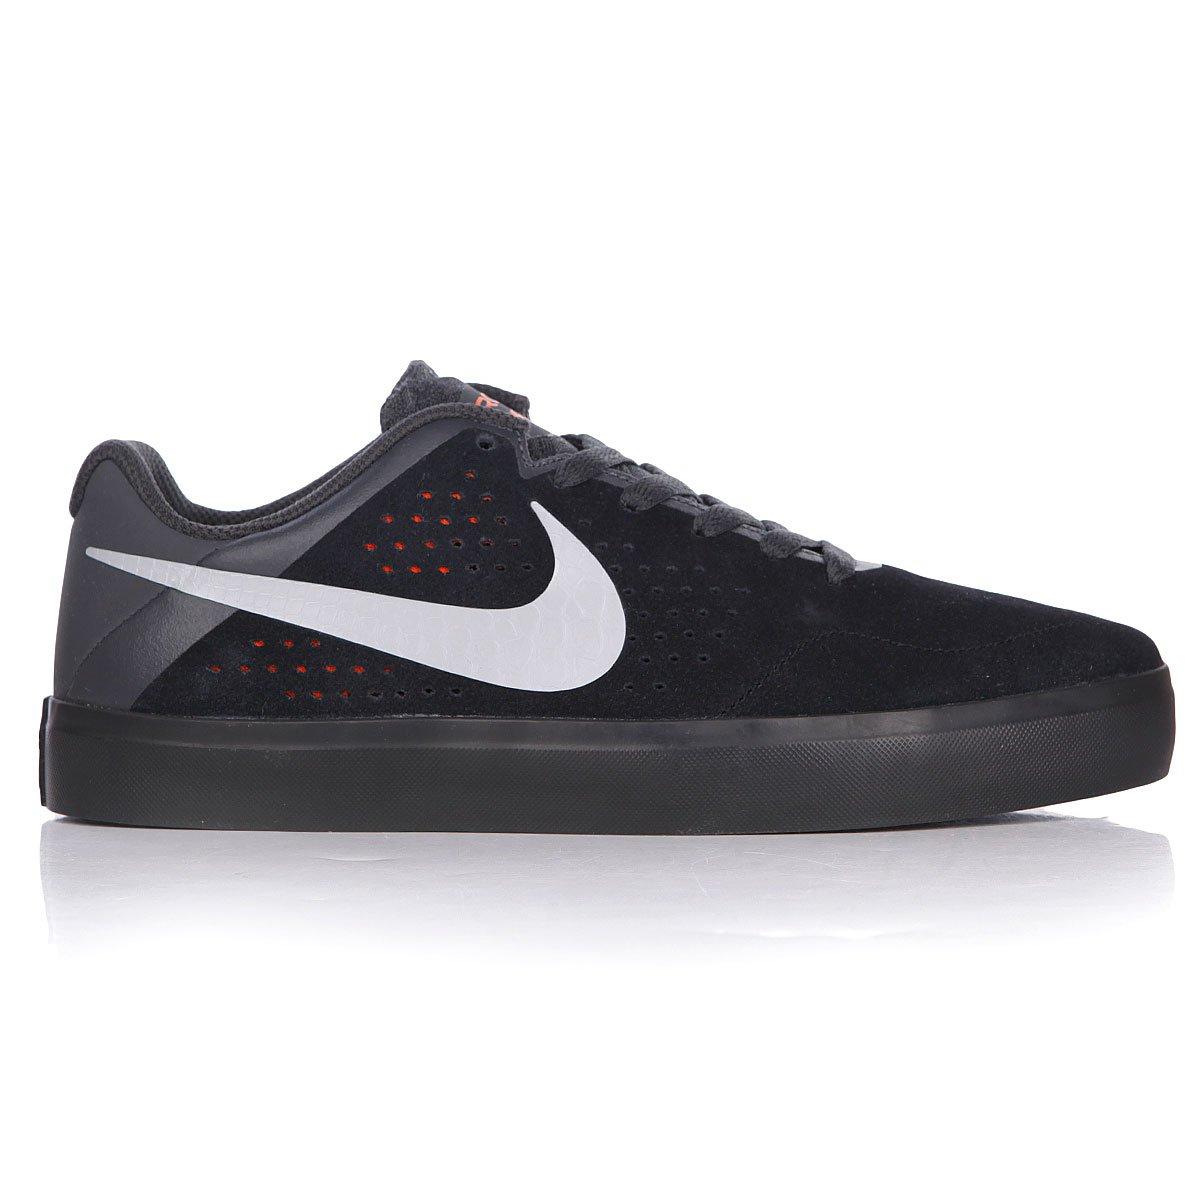 new concept cea41 bebc8 ... Кеды Nike Sb Paul Rodriguez Ctd Lr BlackWolf GreyAnthracite ...